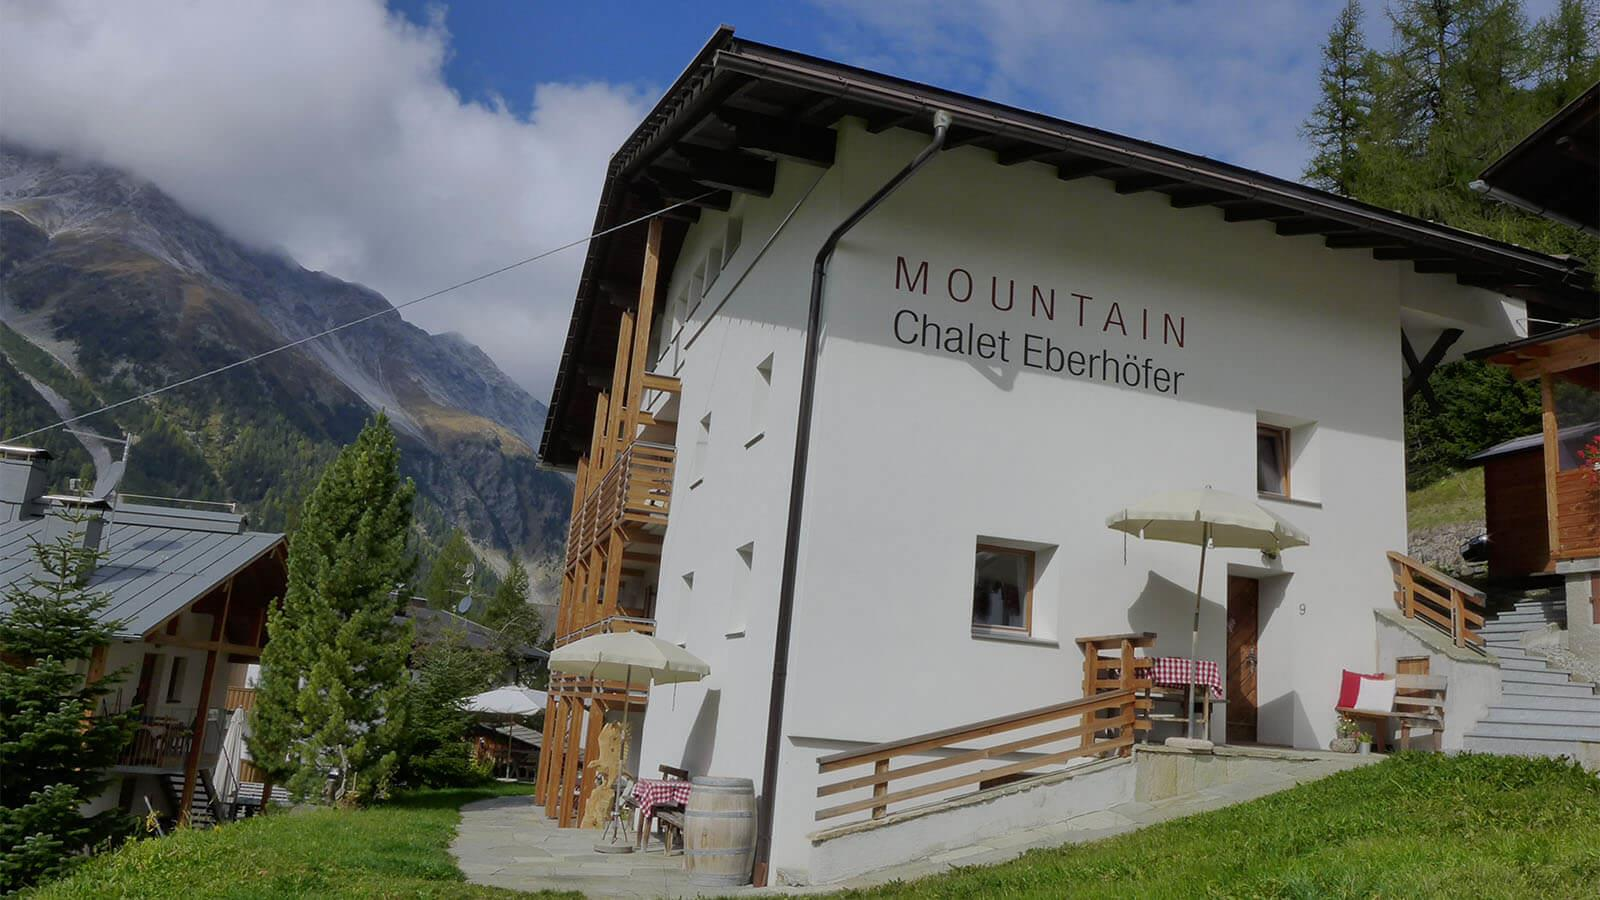 Mountain Chalet Eberhöfer estate